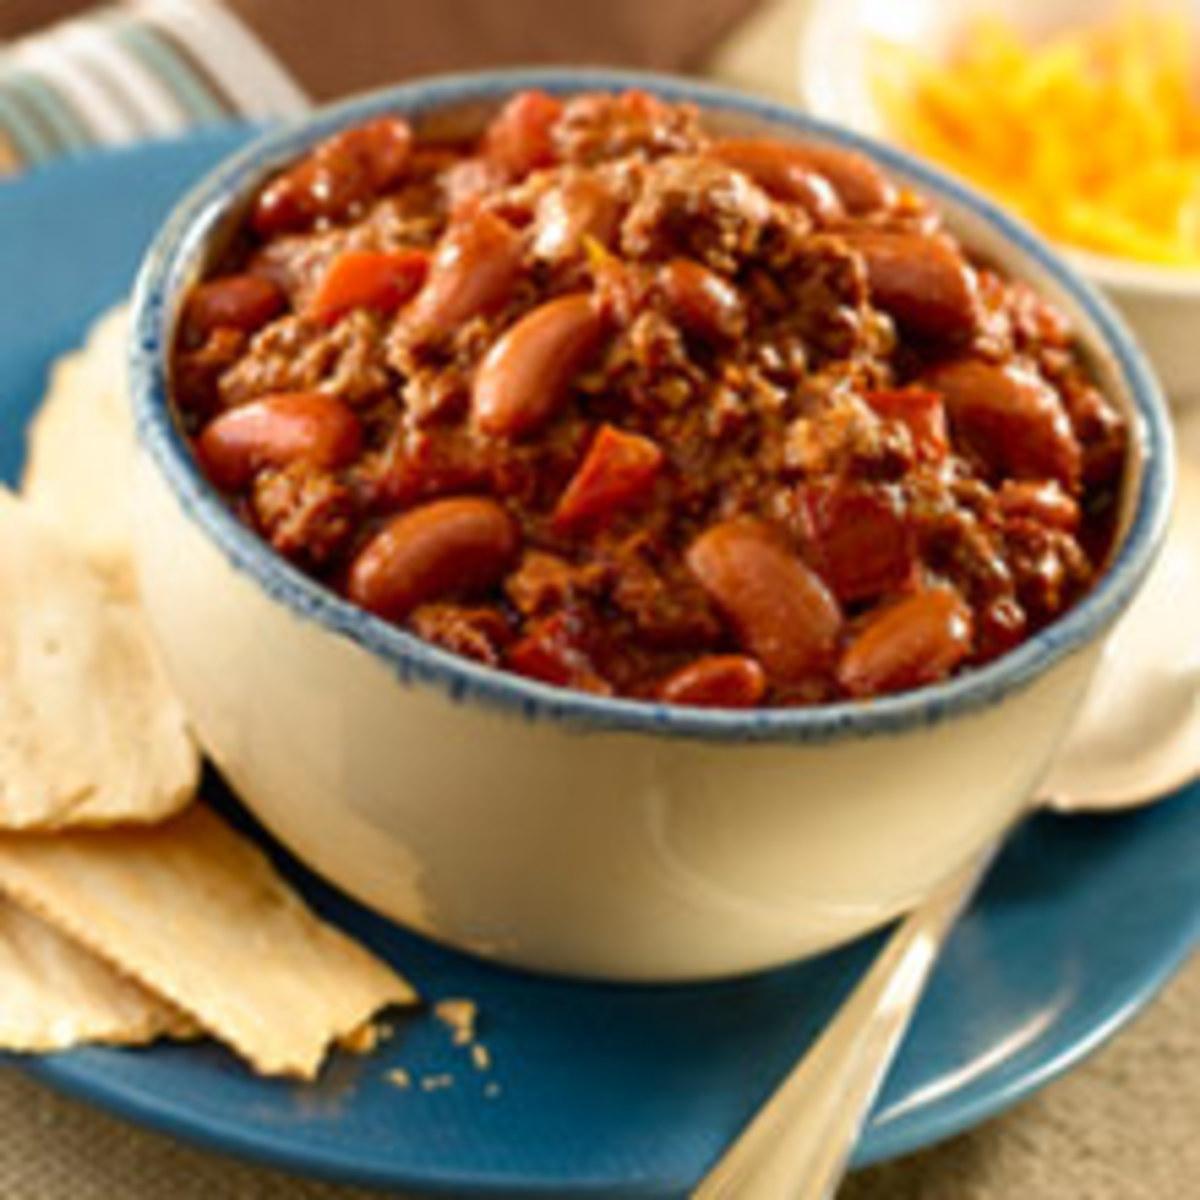 Easy recipes to make chili